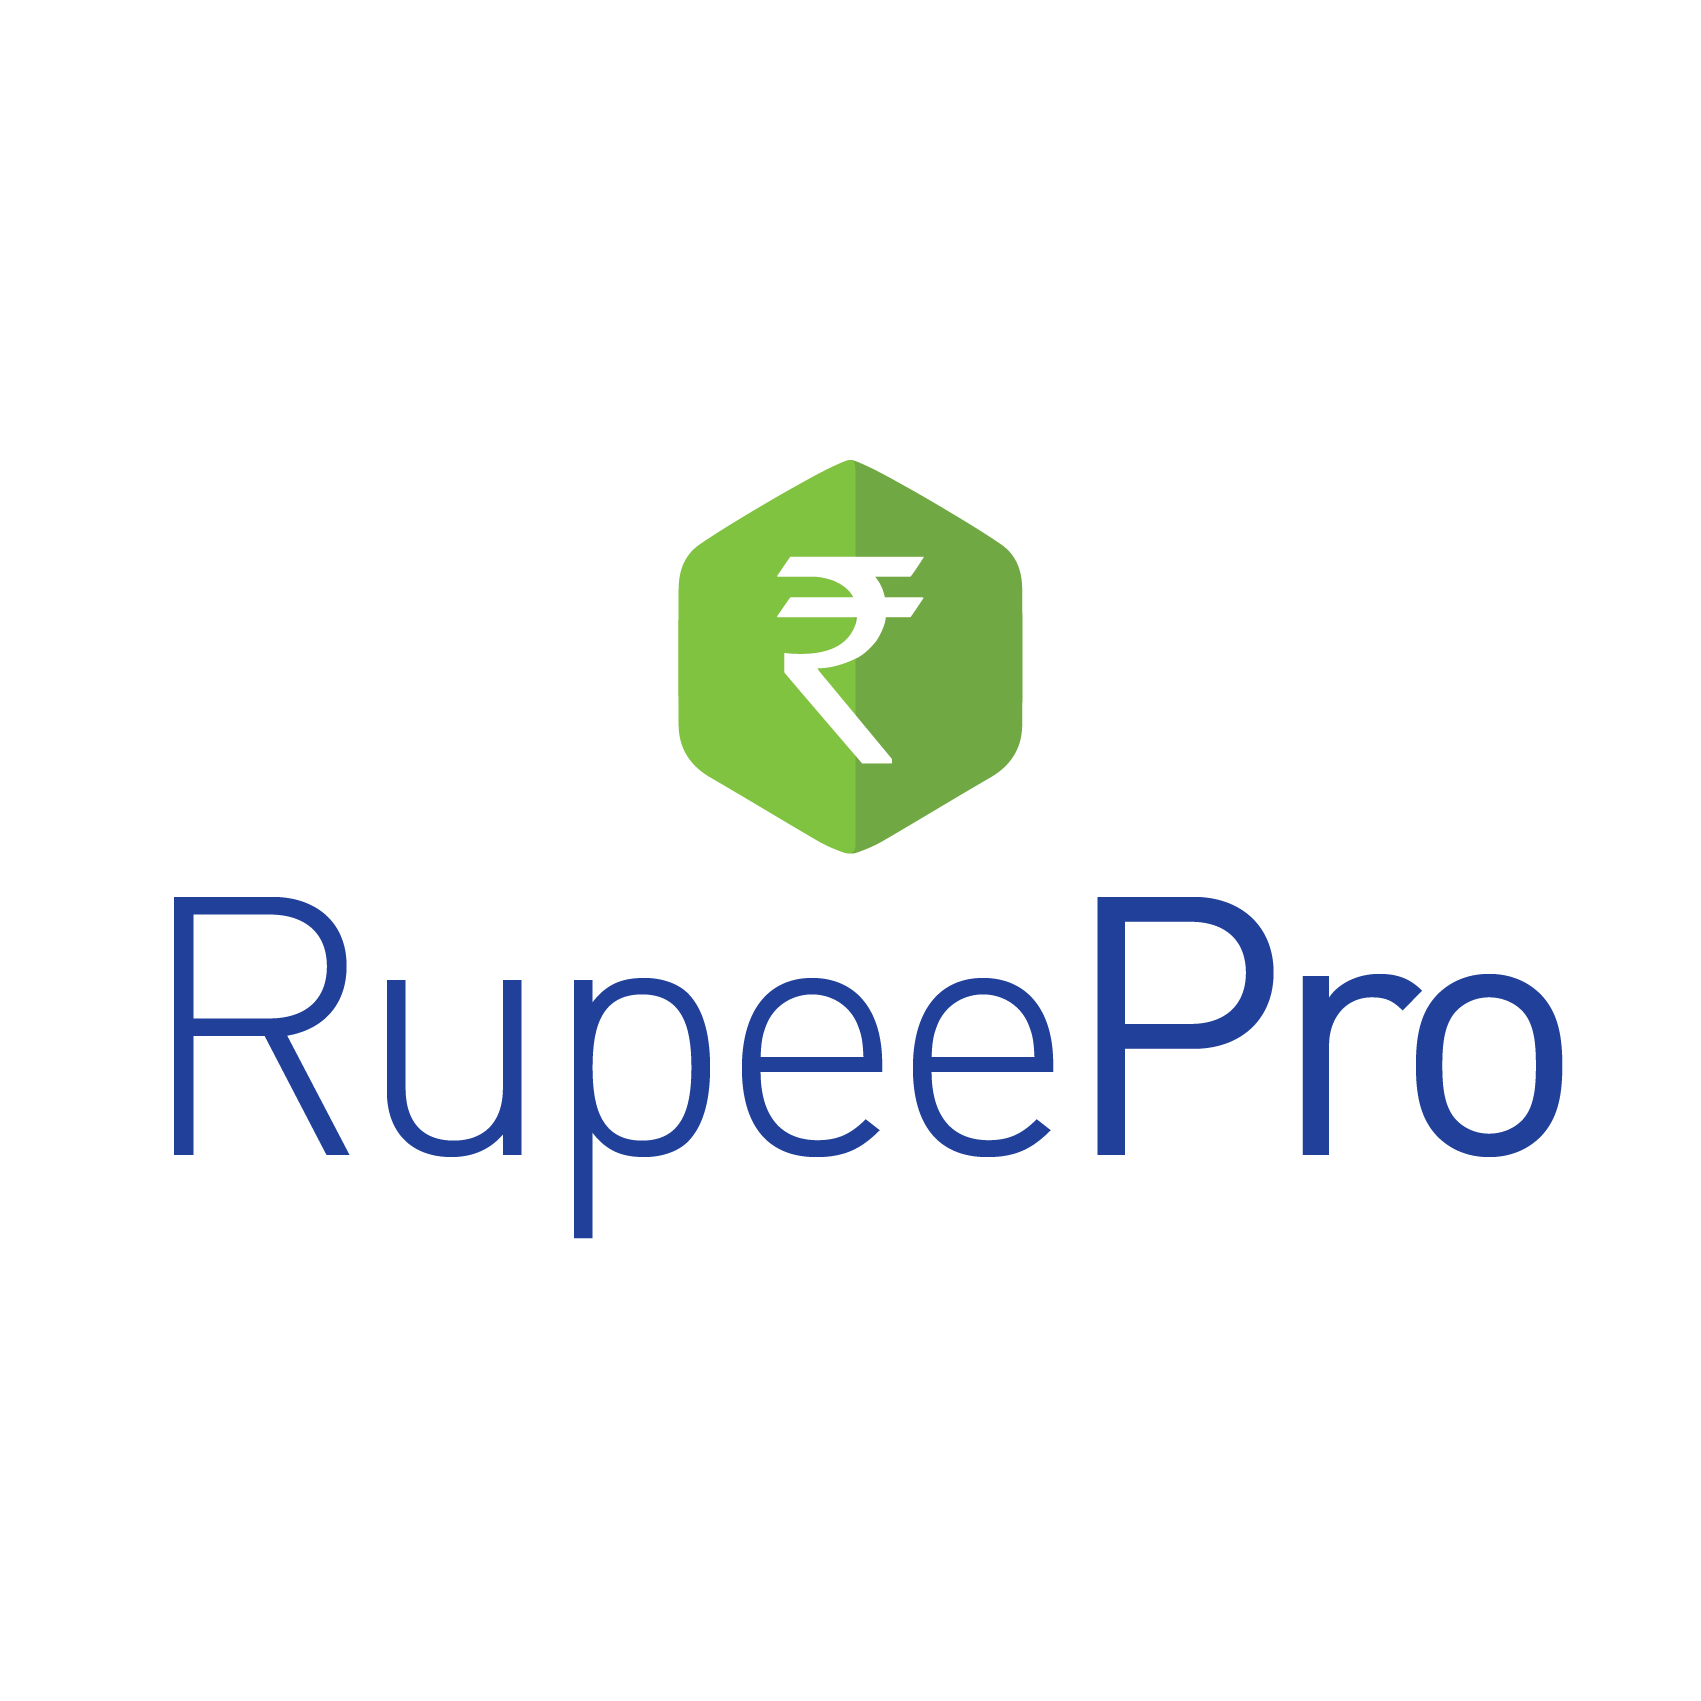 RupeePro logo